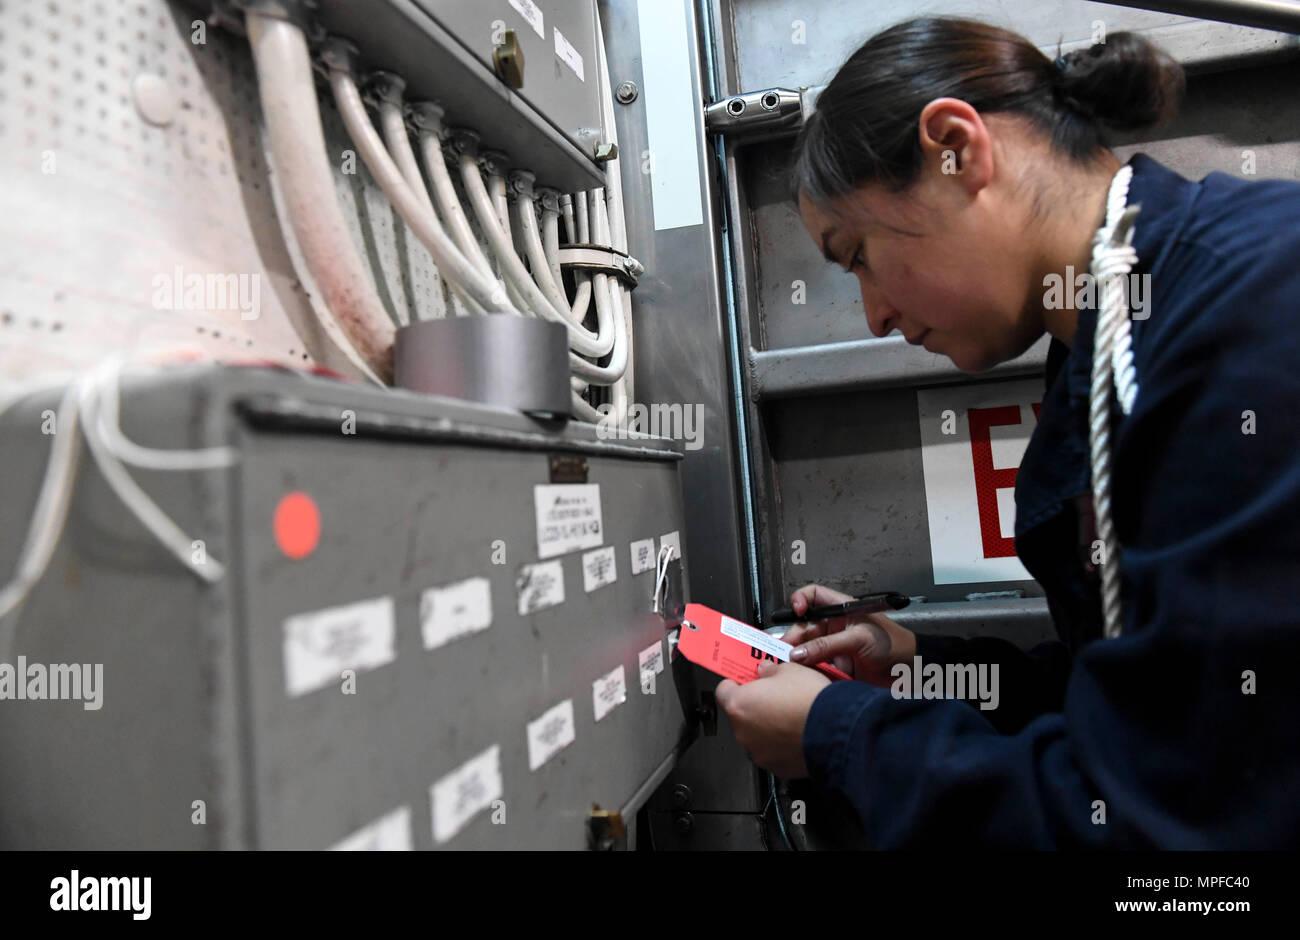 Check And Fuse Box Stock Photos Images Train 170222 N Rm689 026 South China Sea Feb 22 2017